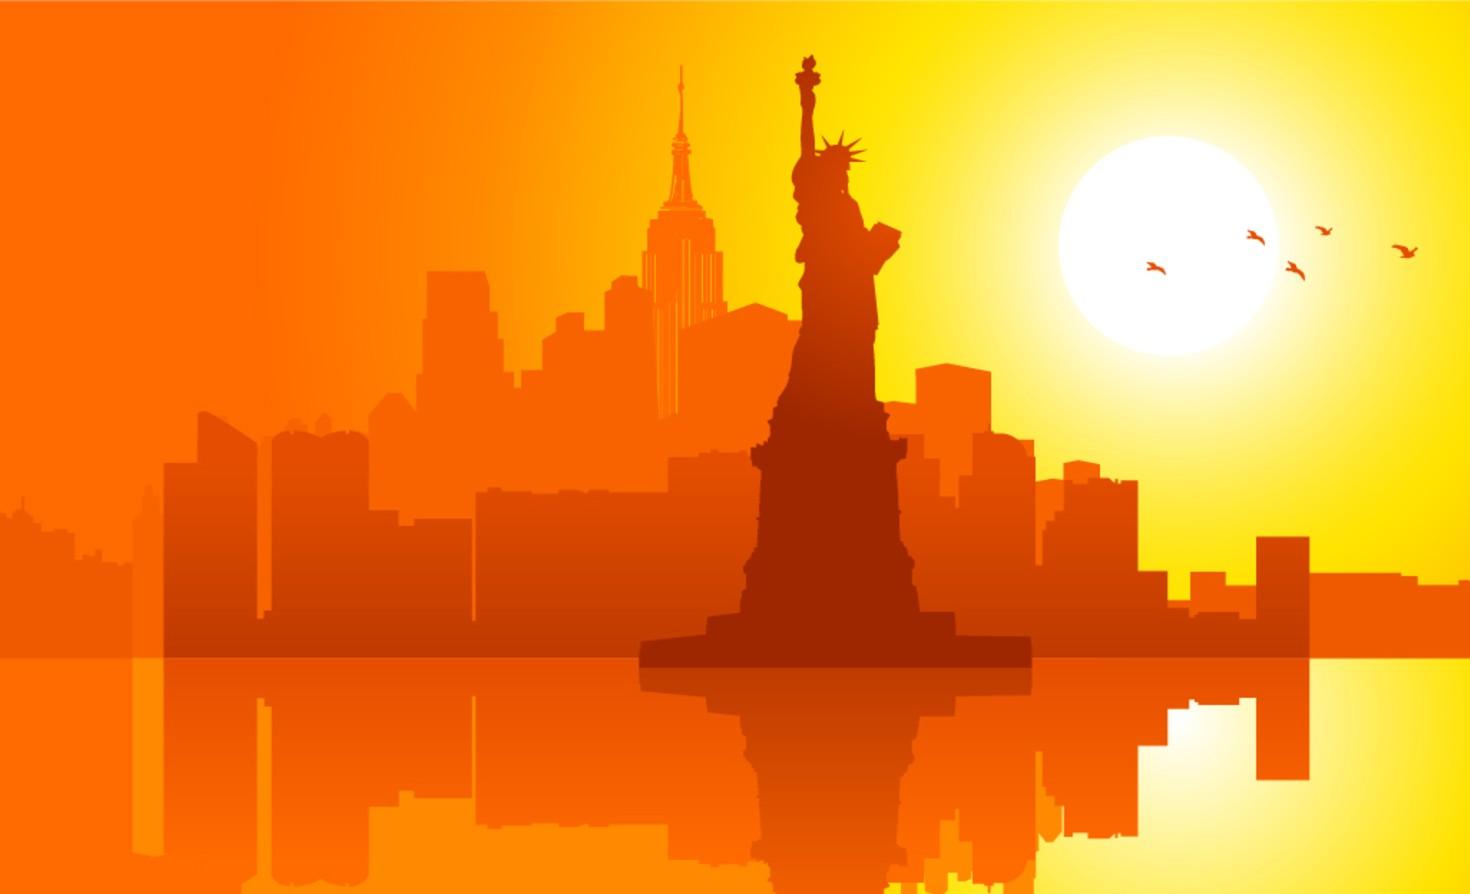 Lady Liberty illustration at sunset